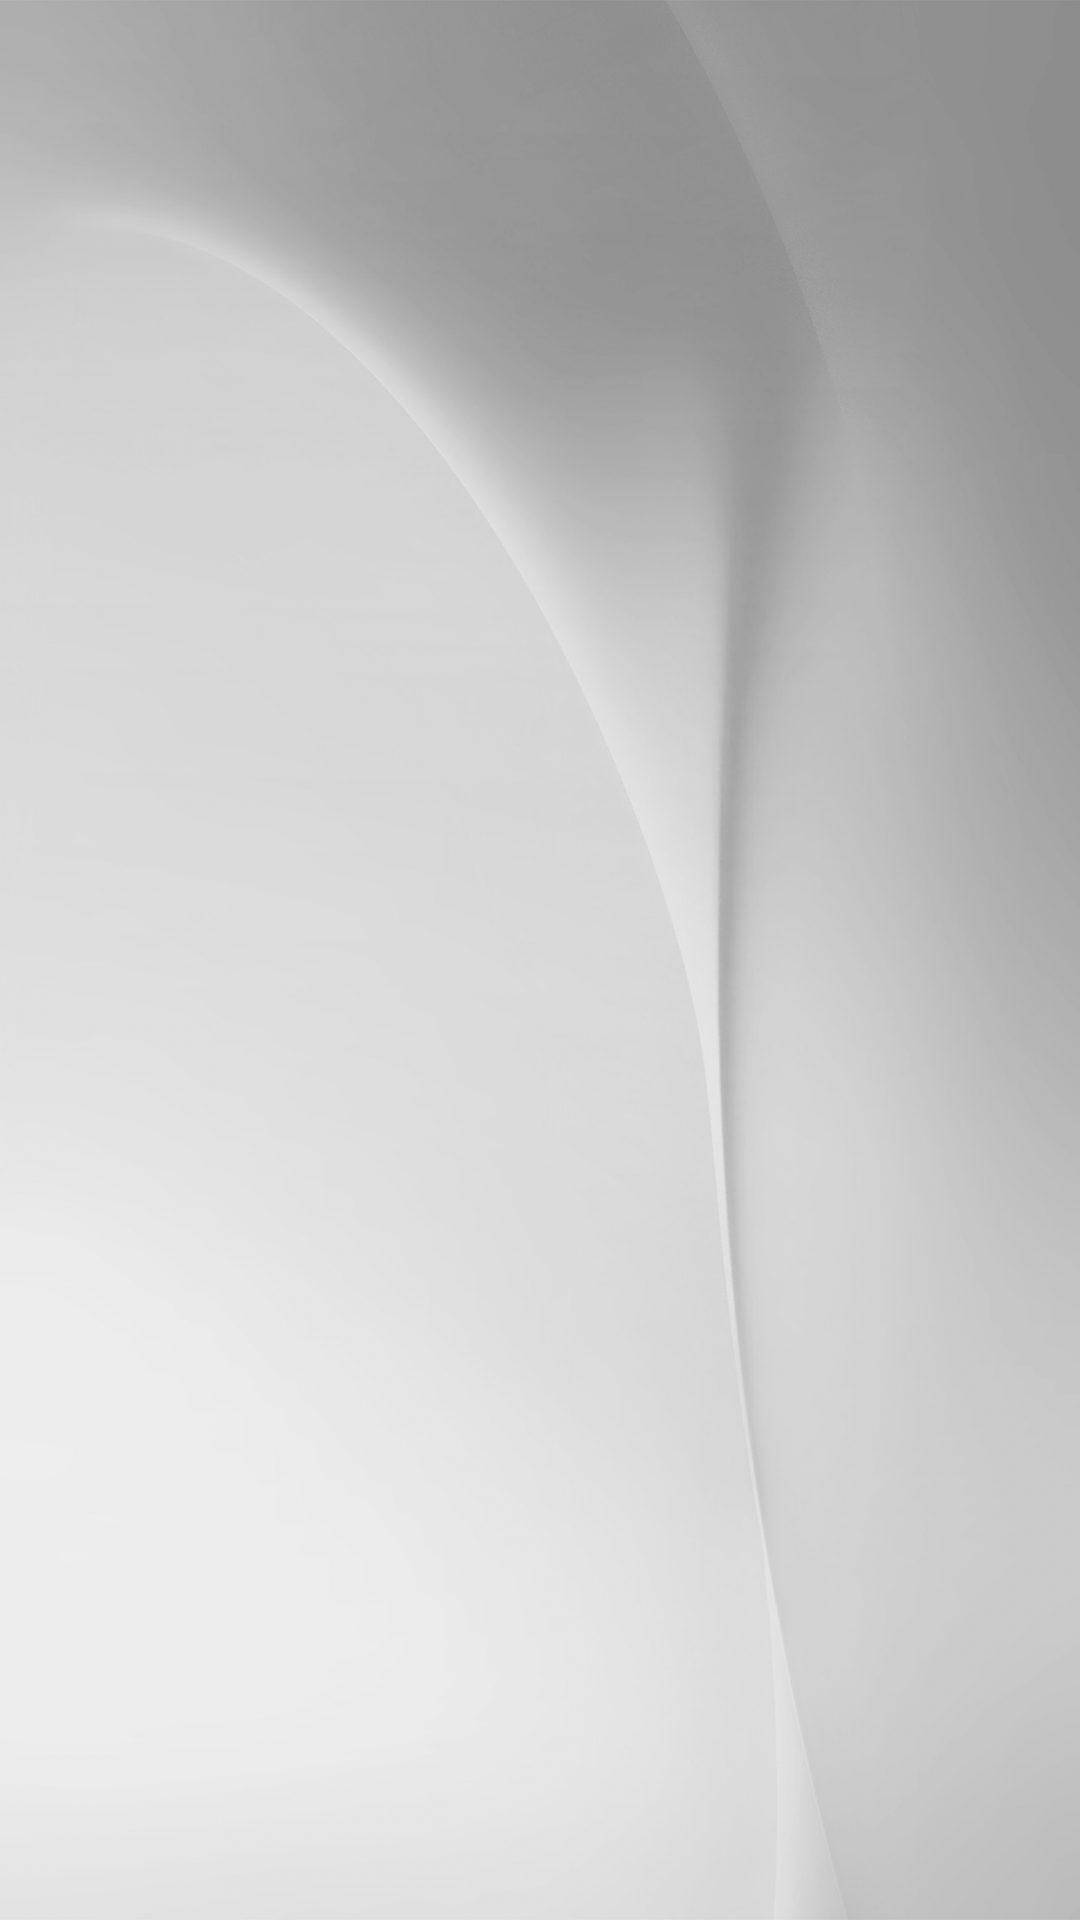 Deep Ocean Abstract Digital Soft White Pattern